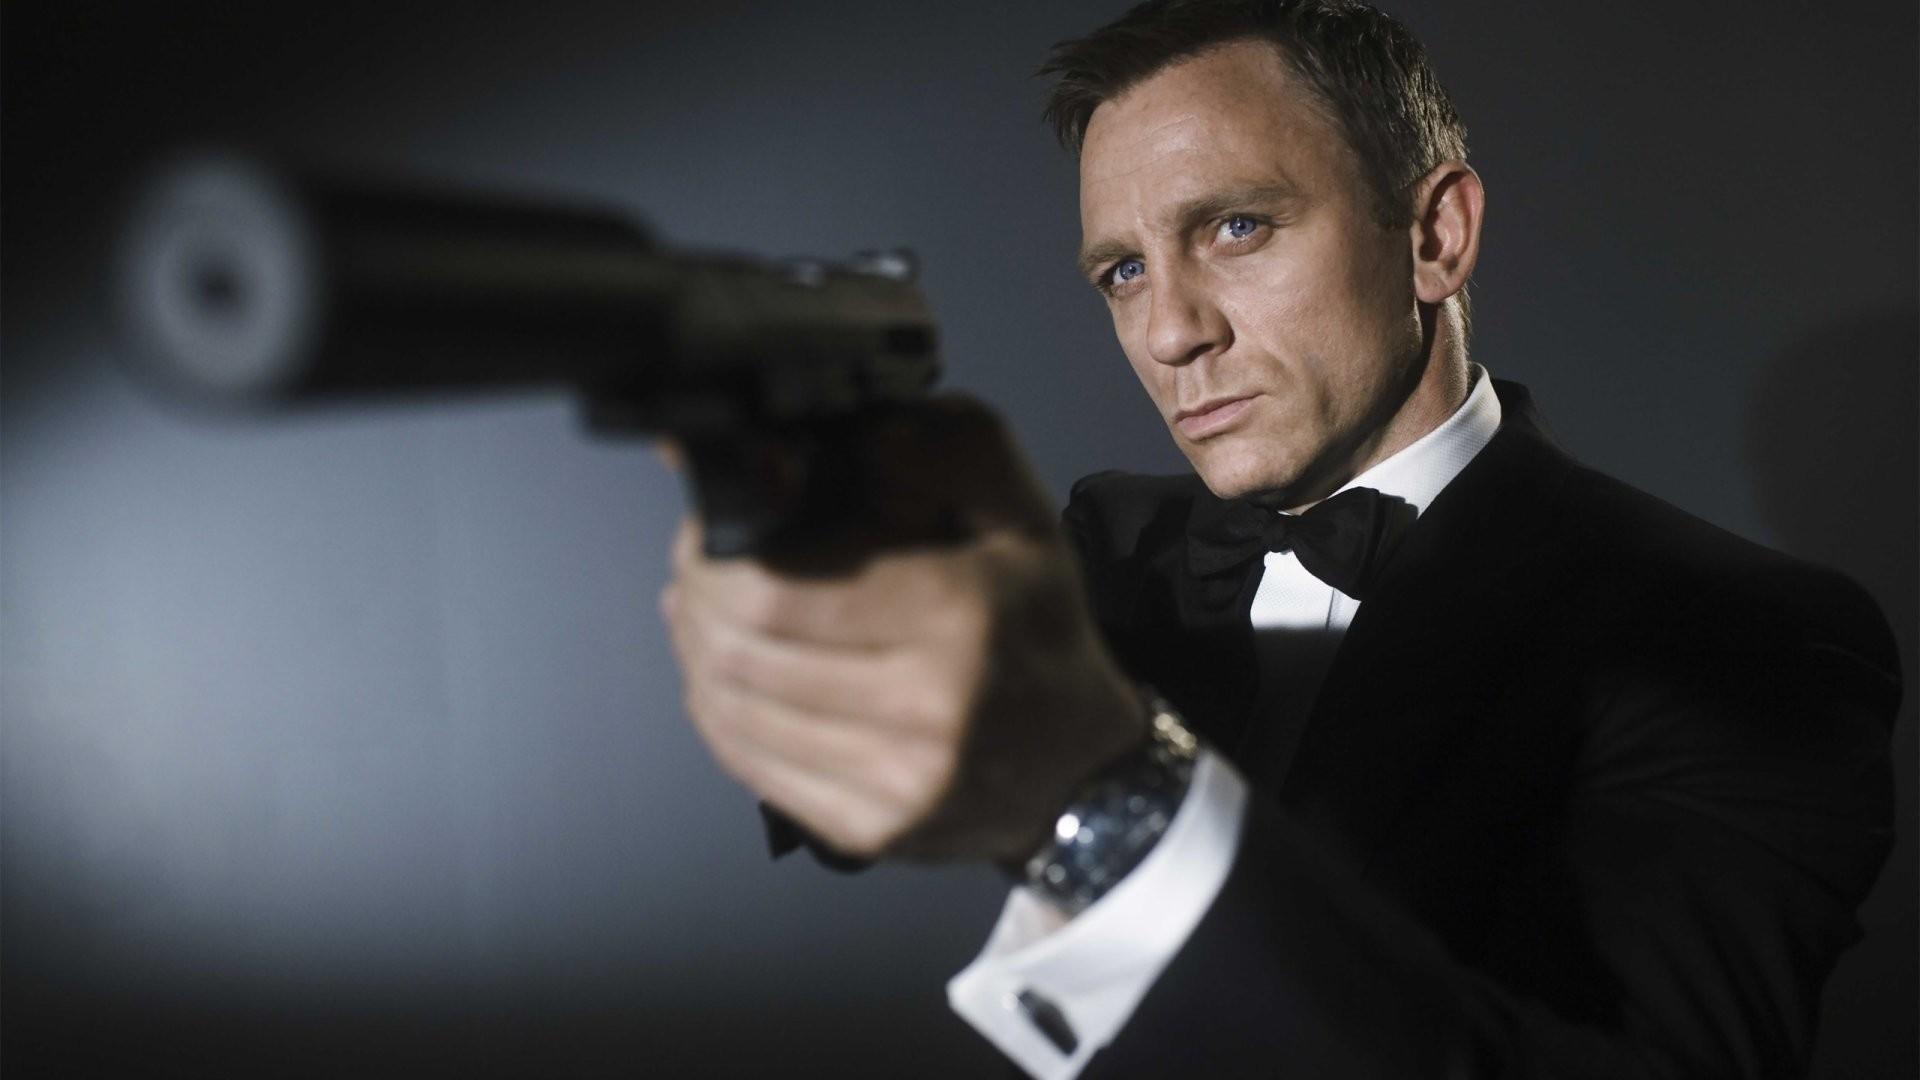 1920x1080 James Bond Casino Royale Wallpaper WallDevil